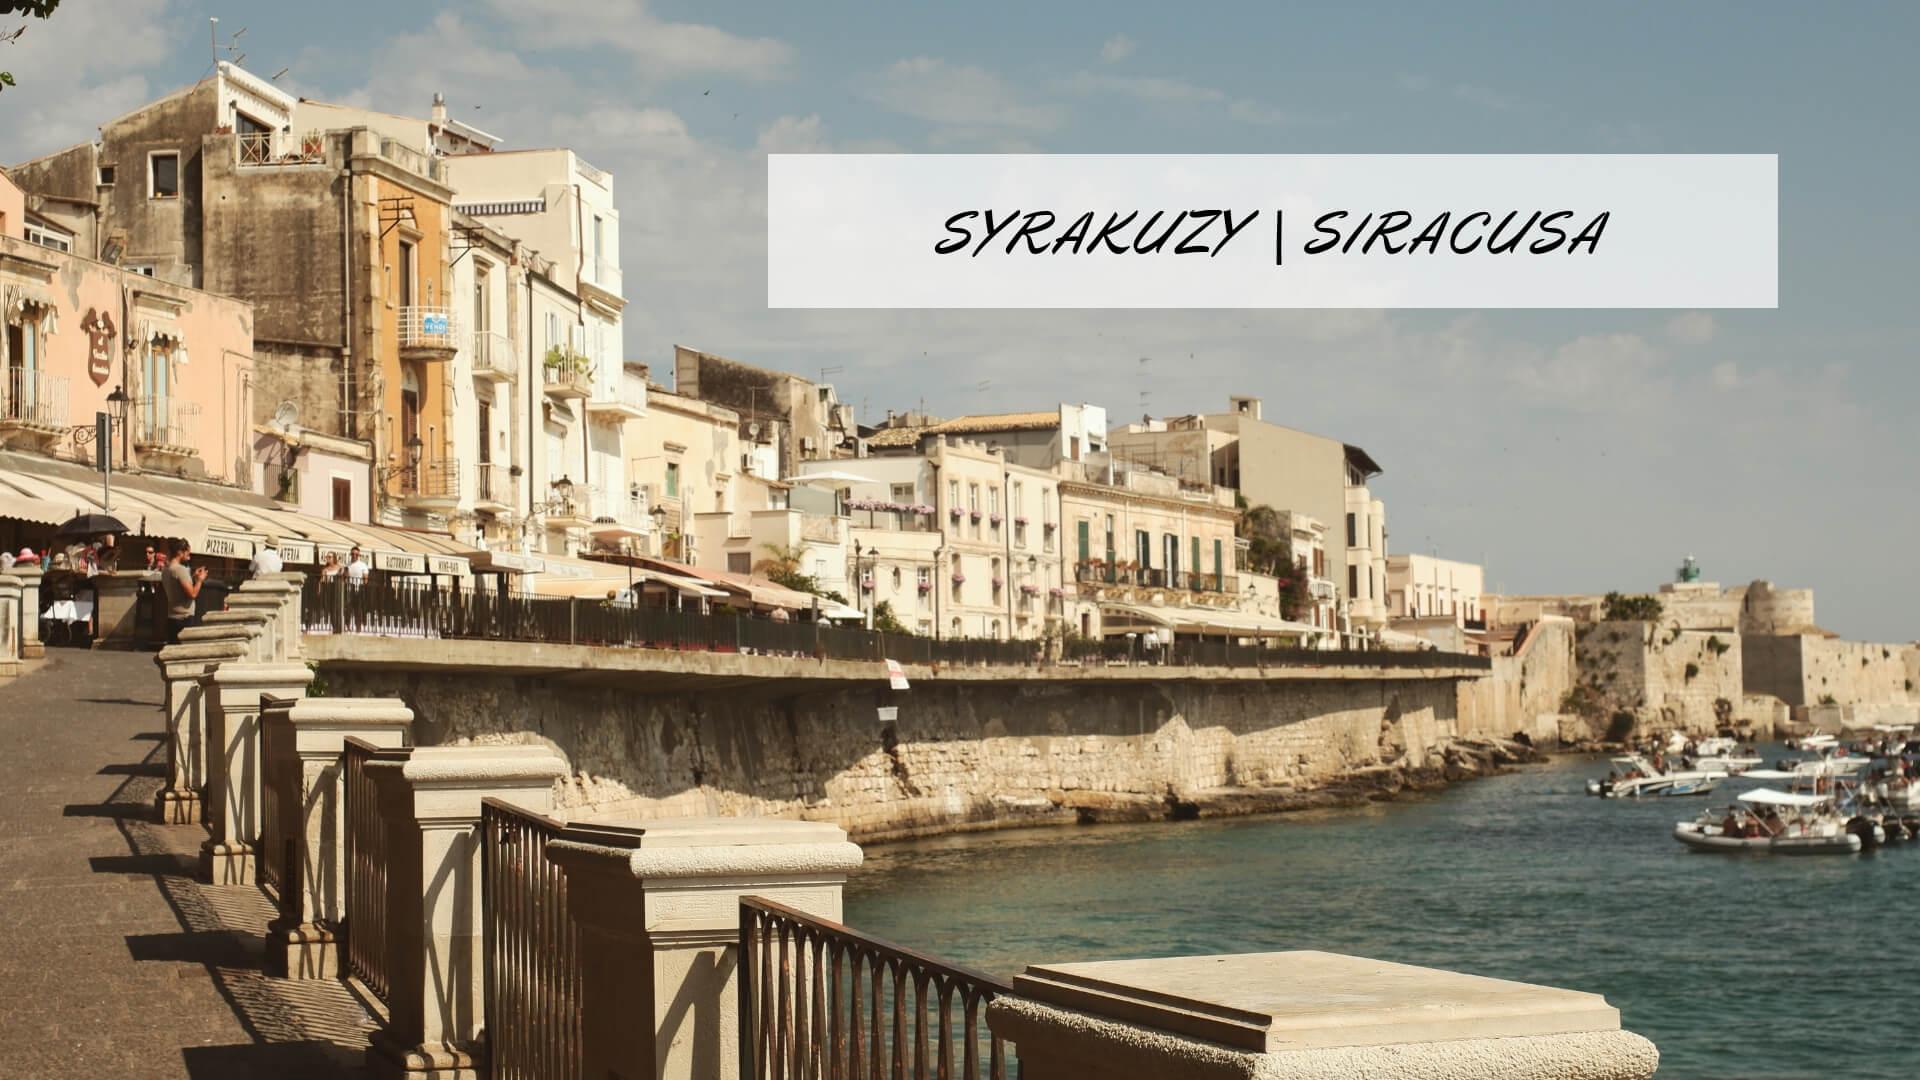 Syrakuzy